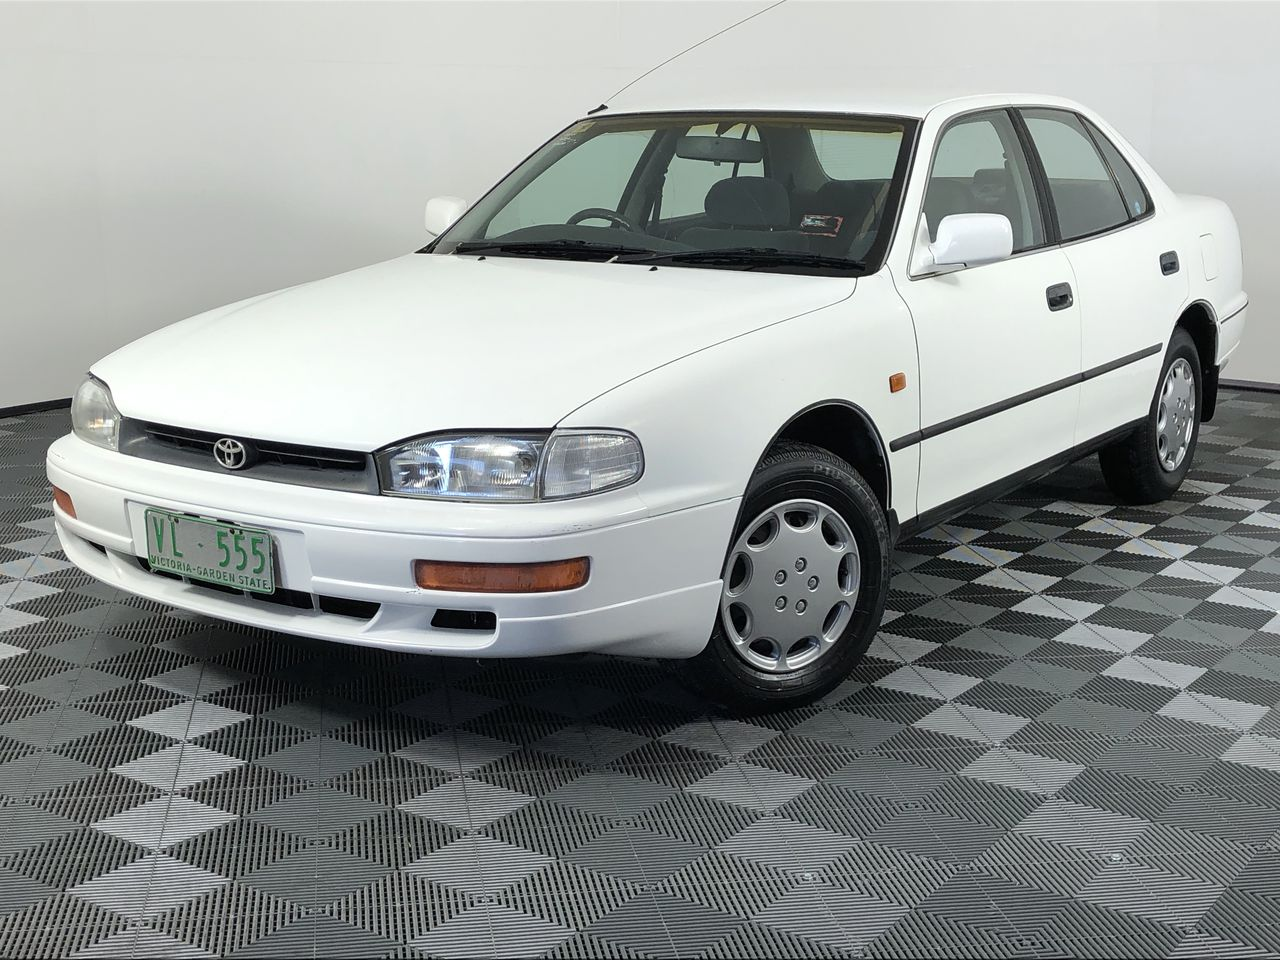 1995 Toyota Camry CS-X SXV10 Automatic Sedan